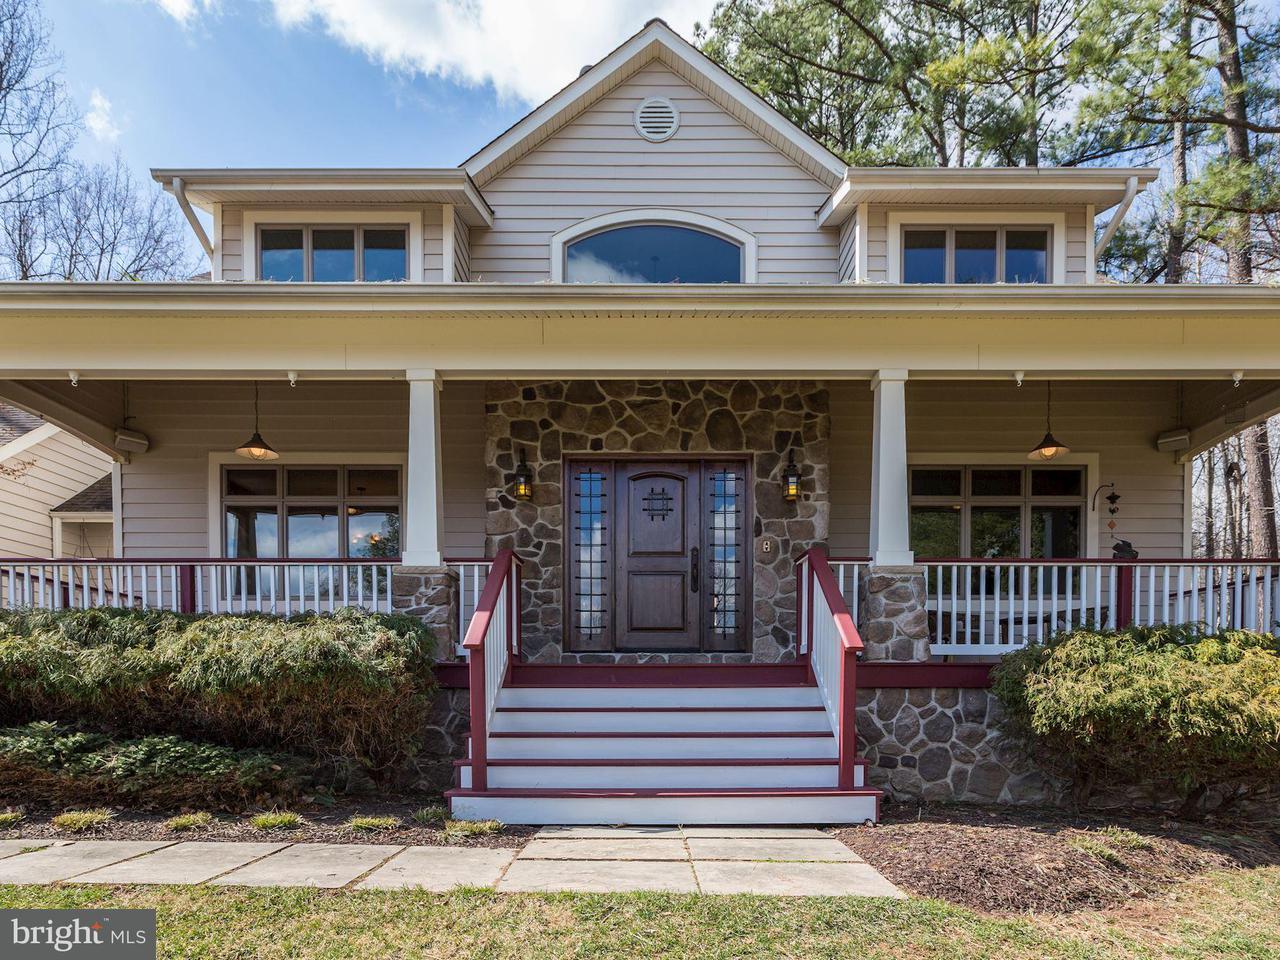 独户住宅 为 销售 在 16746 Whites Store Road 16746 Whites Store Road Boyds, 马里兰州 20841 美国